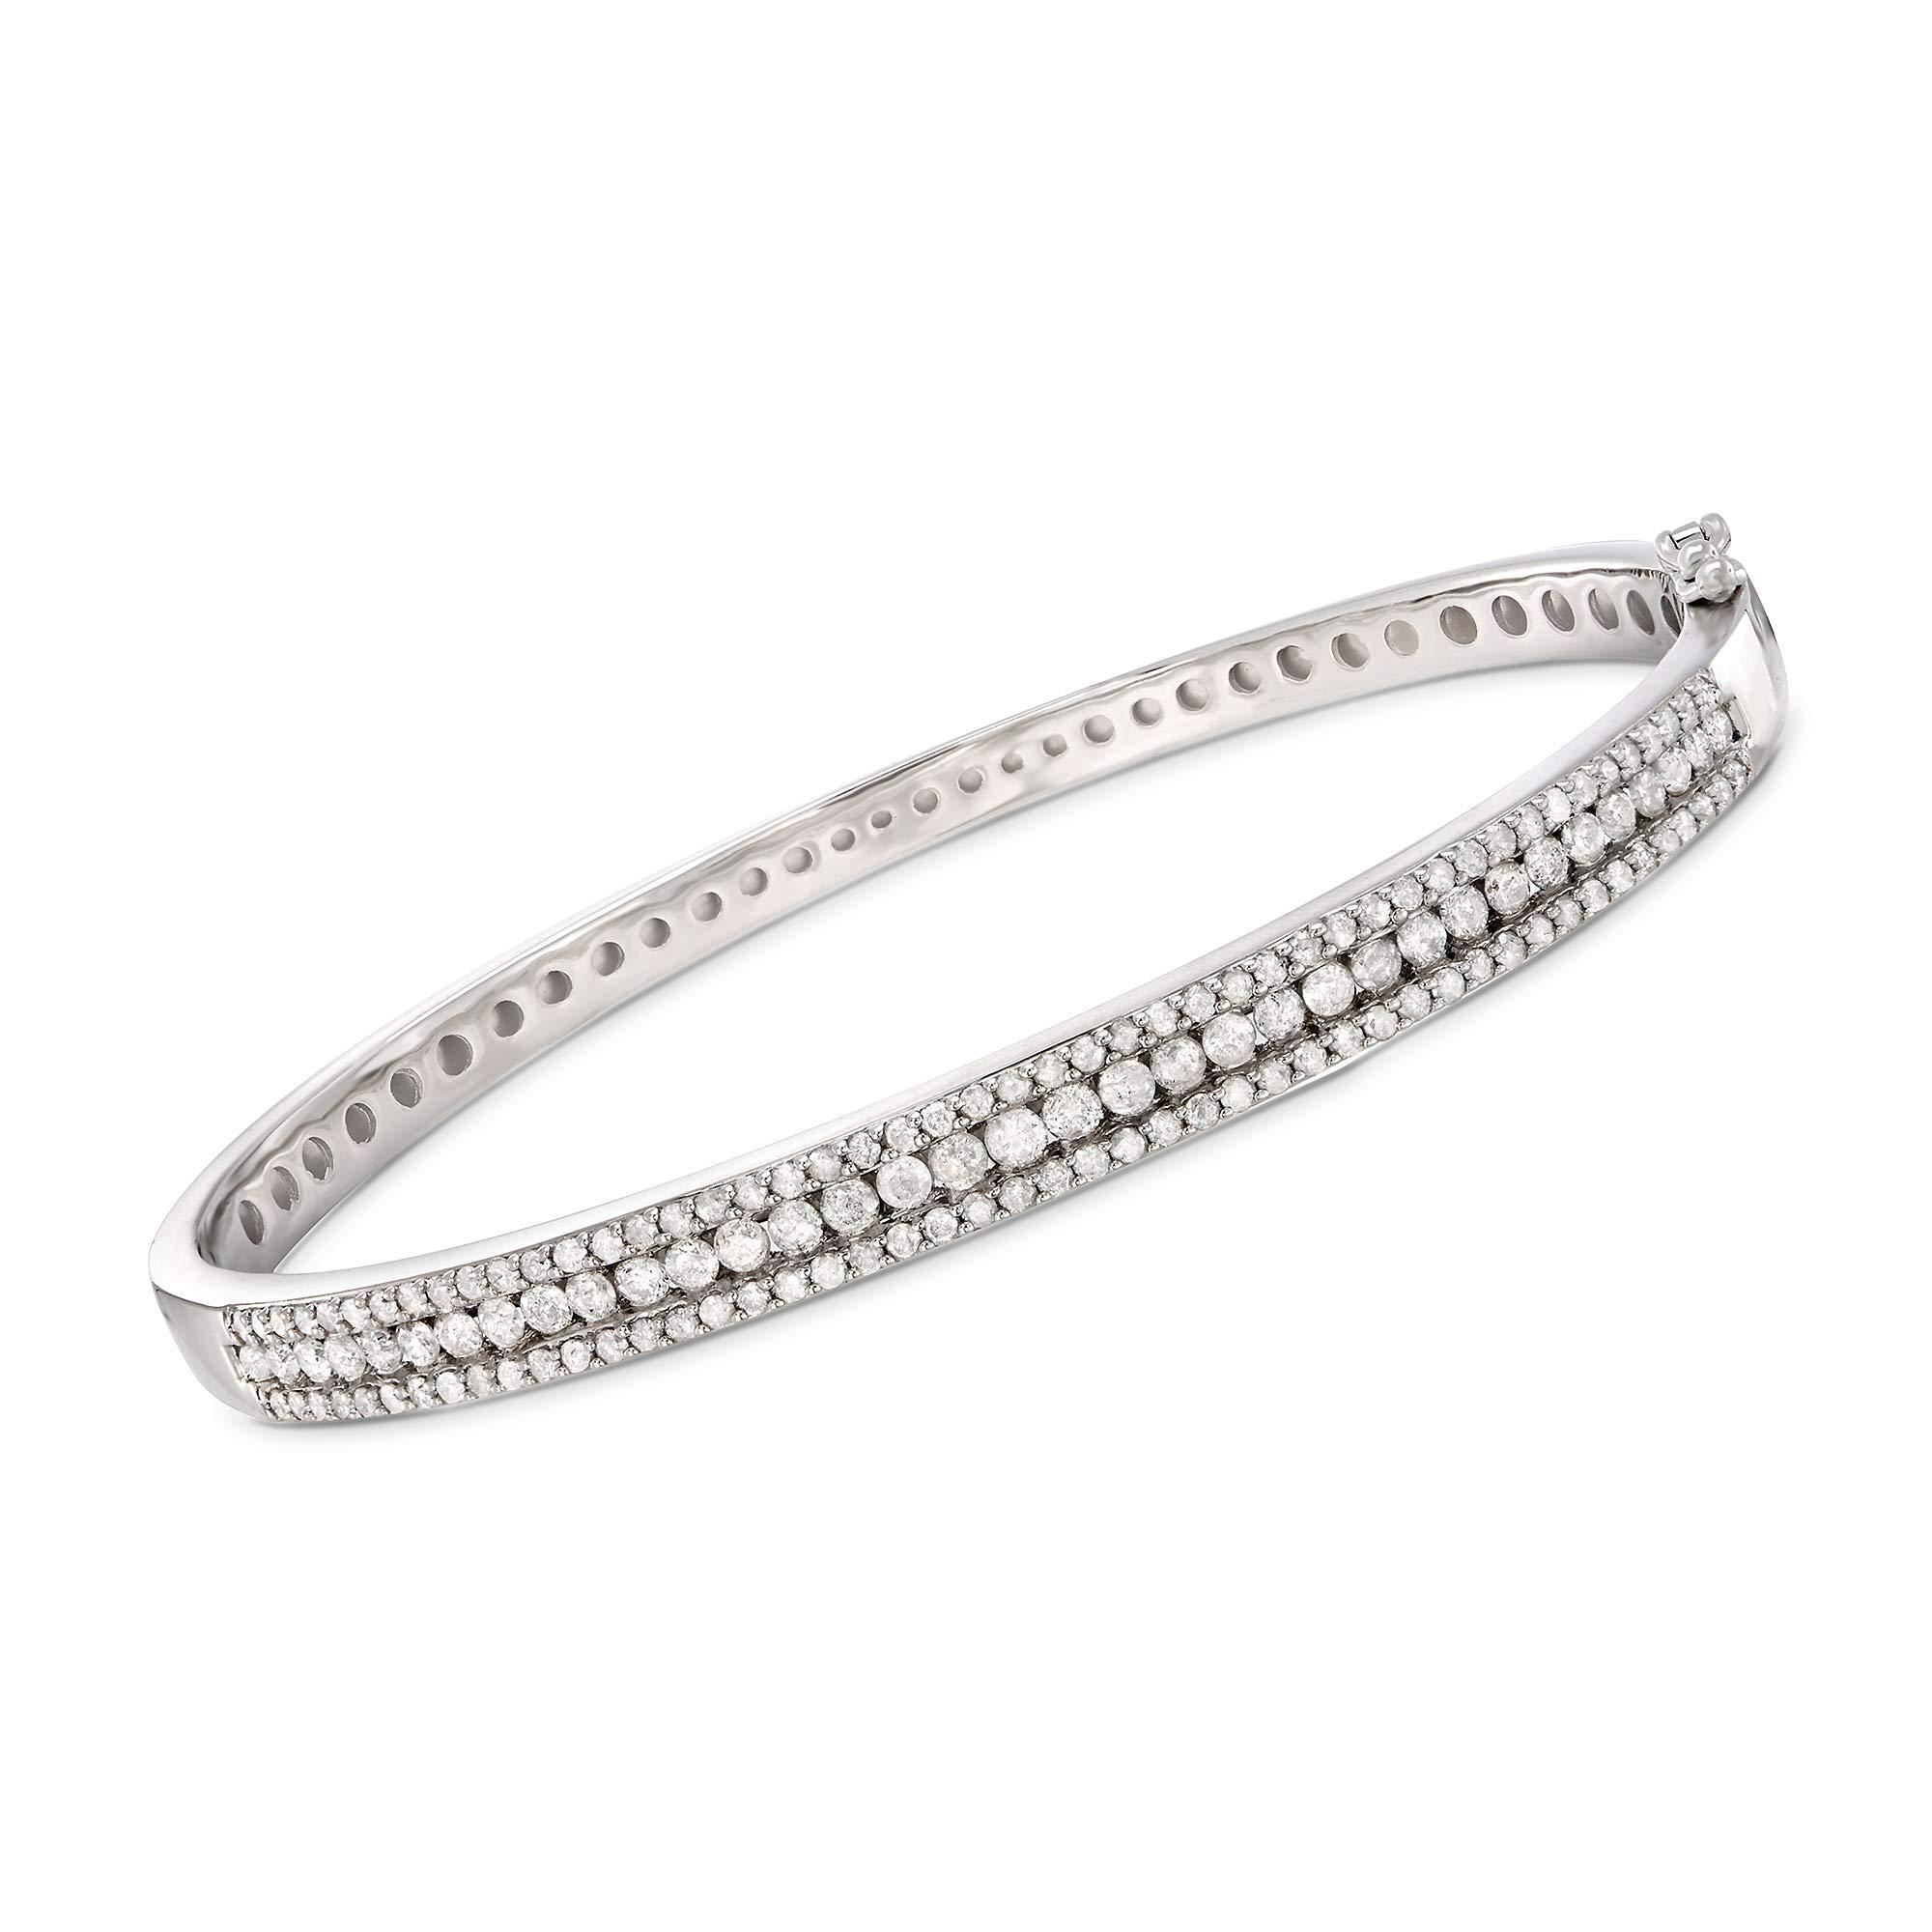 Ross-Simons 2.00 ct. t.w. Diamond Bangle Bracelet in Sterling Silver